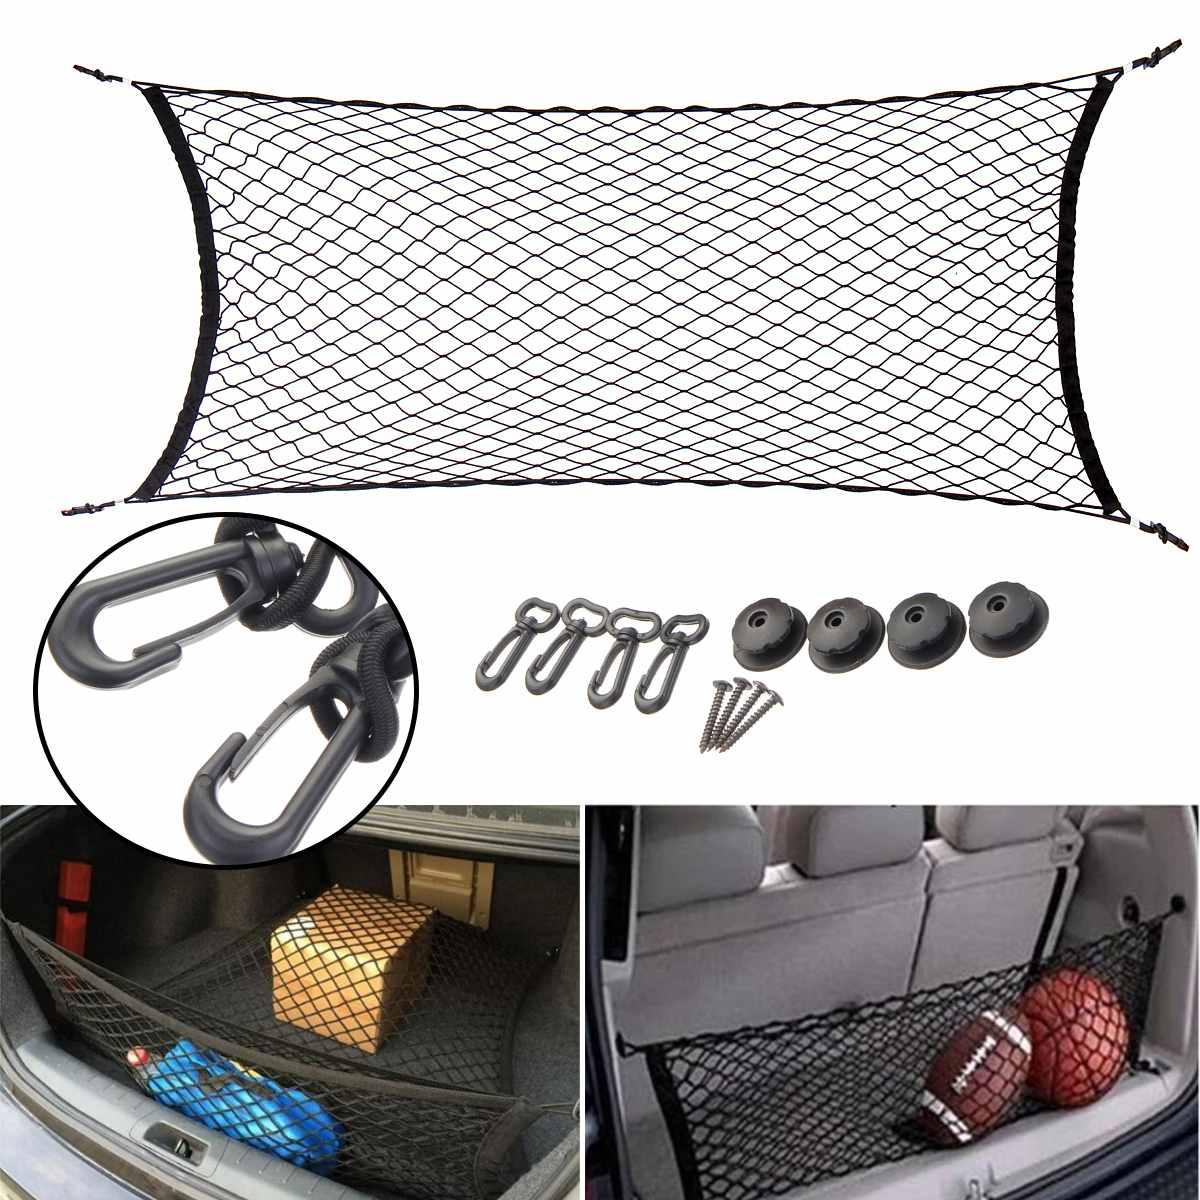 Car Trunk Nets 110 X 50 Cm Elastic Strong Nylon Cargo Luggage Storage Organizer Net Mesh With Hooks